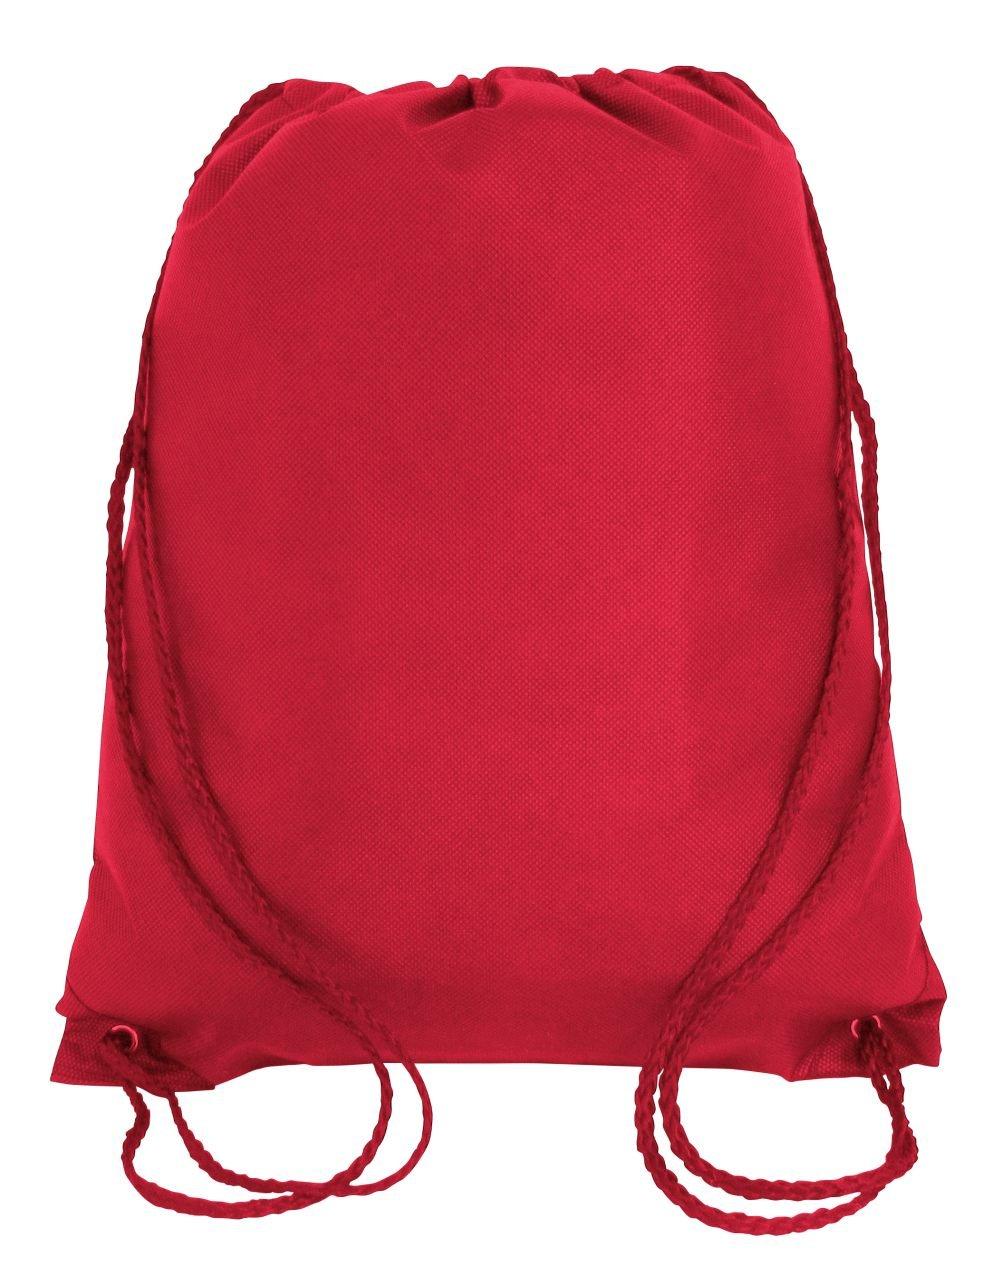 Drawstring Backpack Cinch Daypack Lightweight Gym Sack Bag Training, Sports, Travel (24, Red)